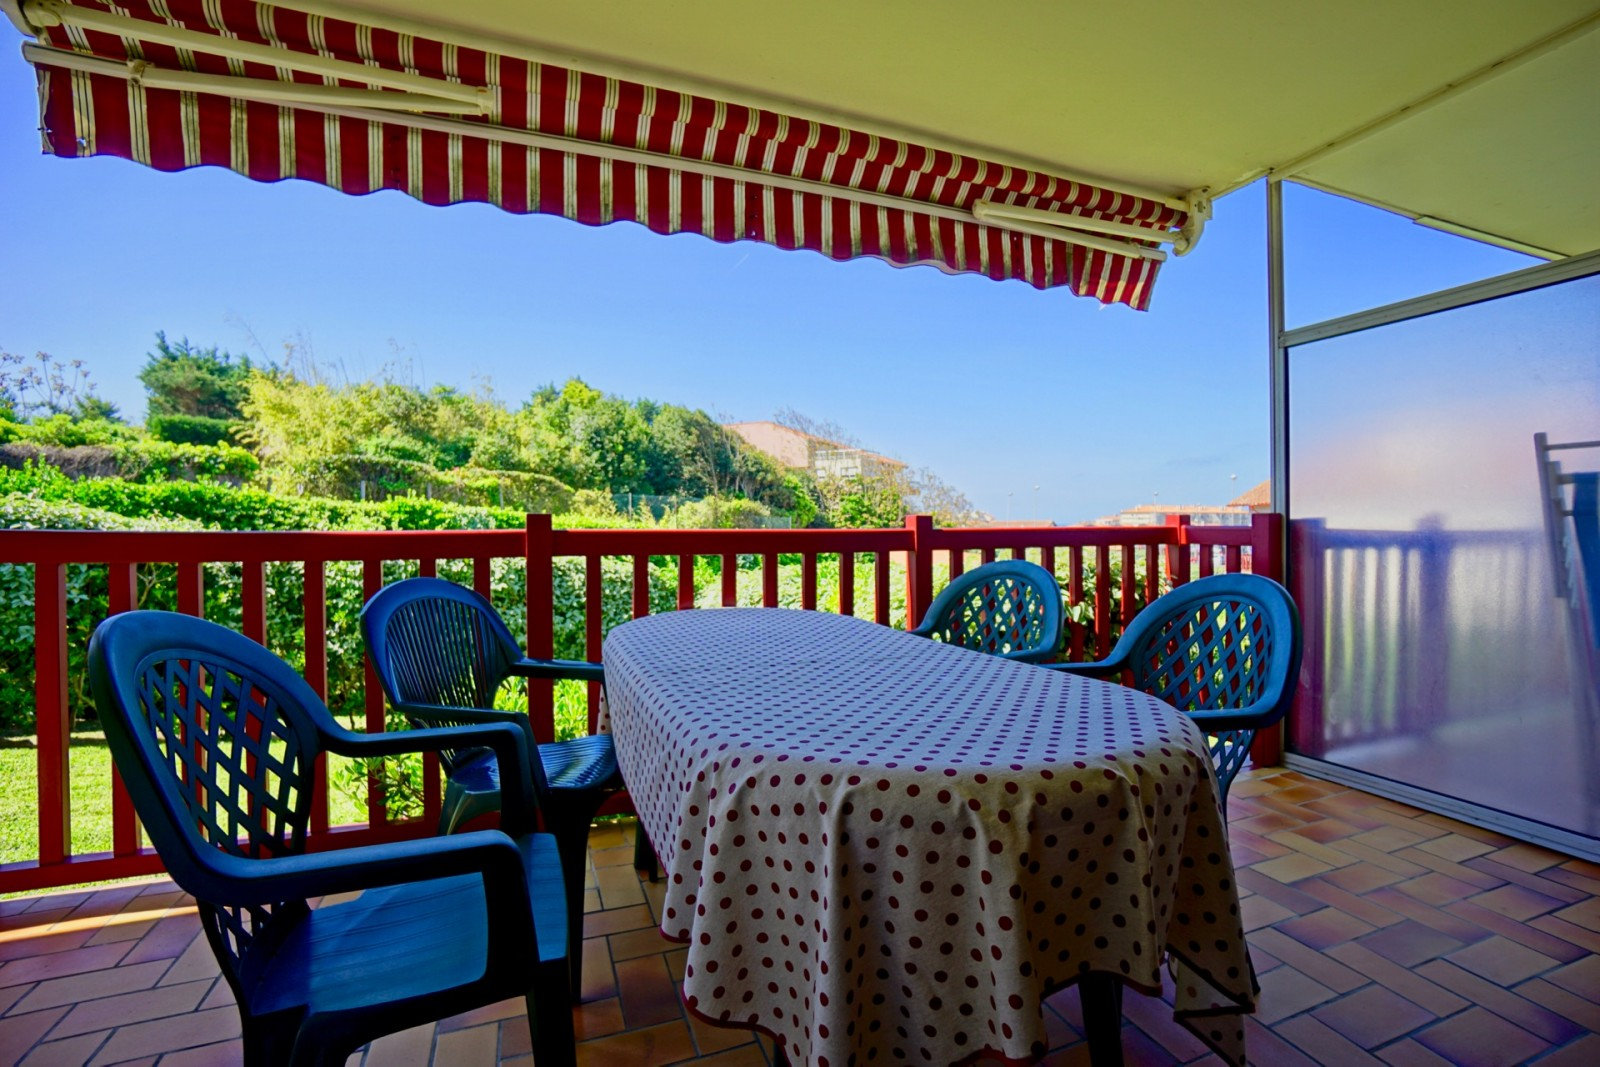 Le calme la chambre d amour agence olaizola location - Restaurants anglet chambre d amour ...